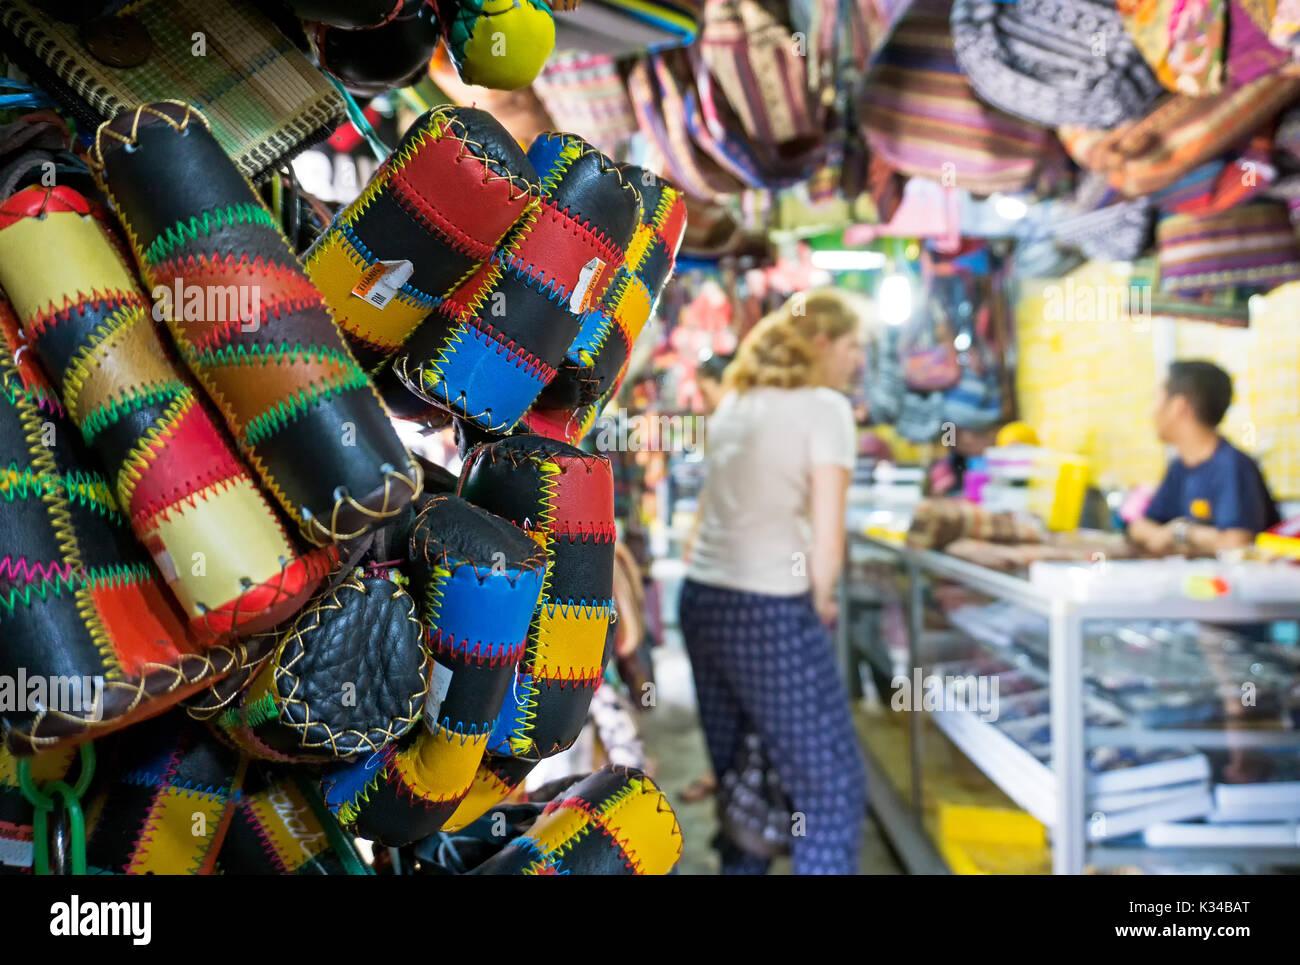 Souvenir display in Filipino souvenir market in Sabah Borneo, Kota Kinabalu, Malaysia. - Stock Image